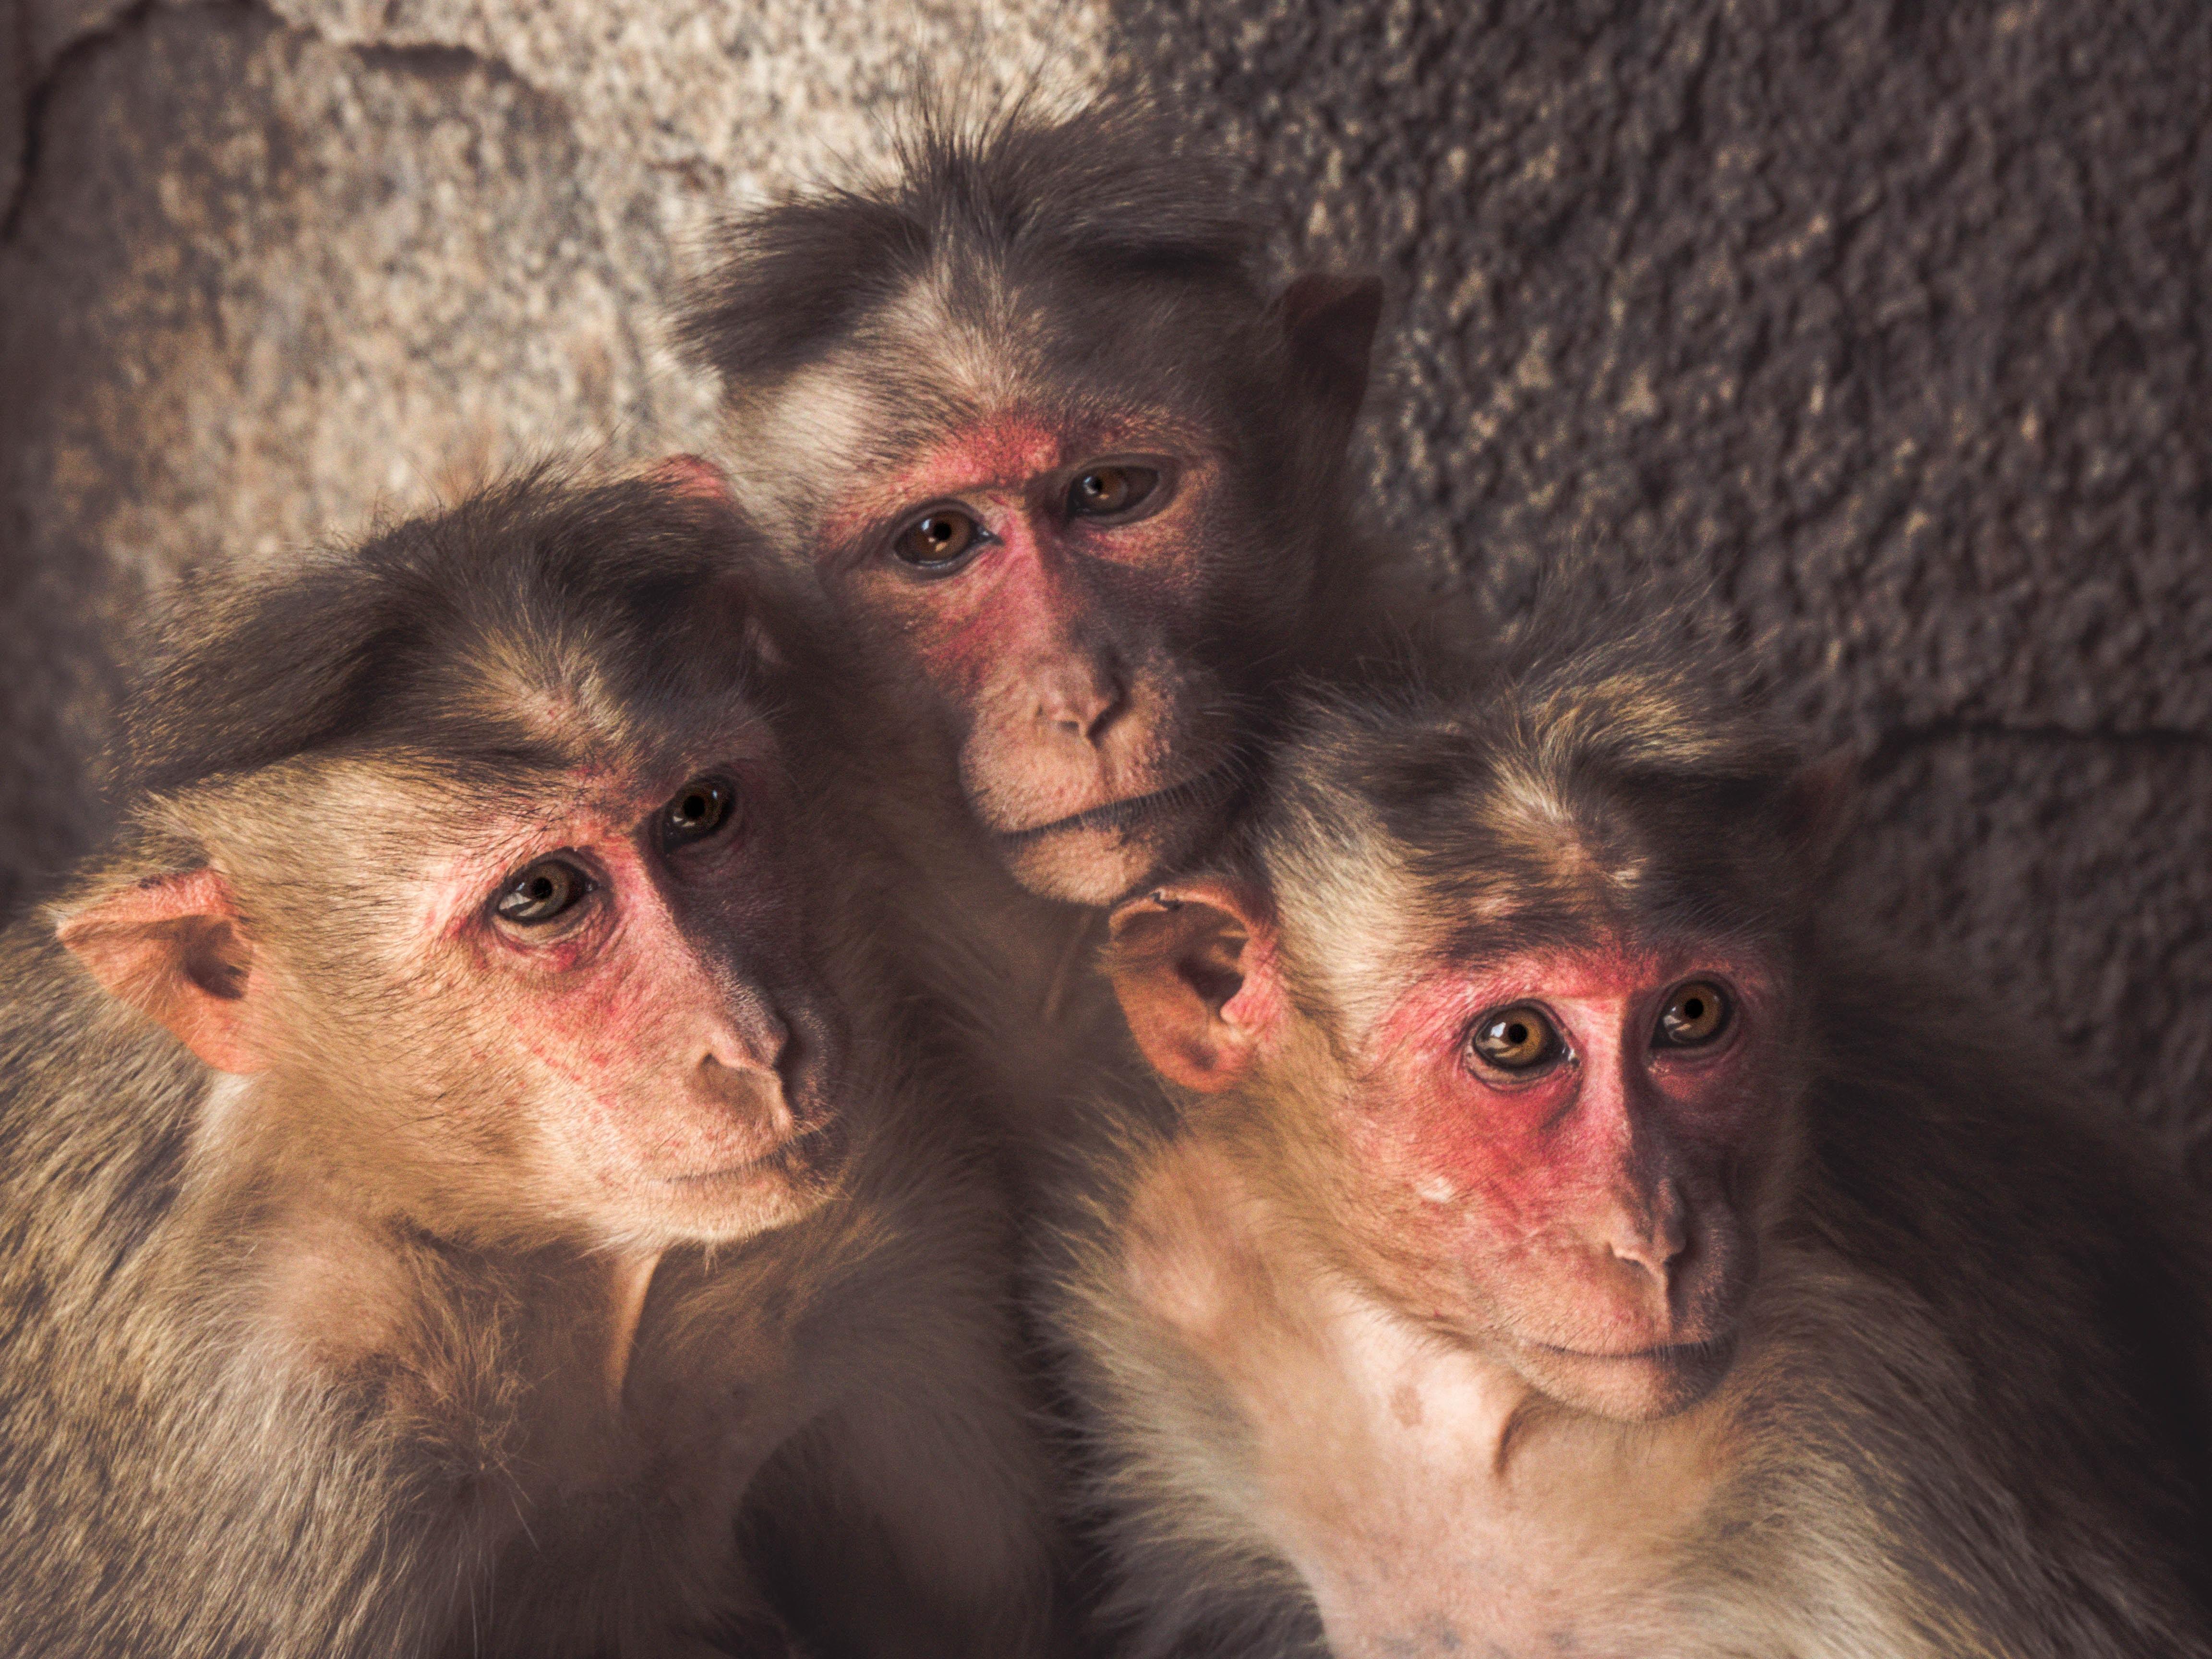 three monkeys standing near wall